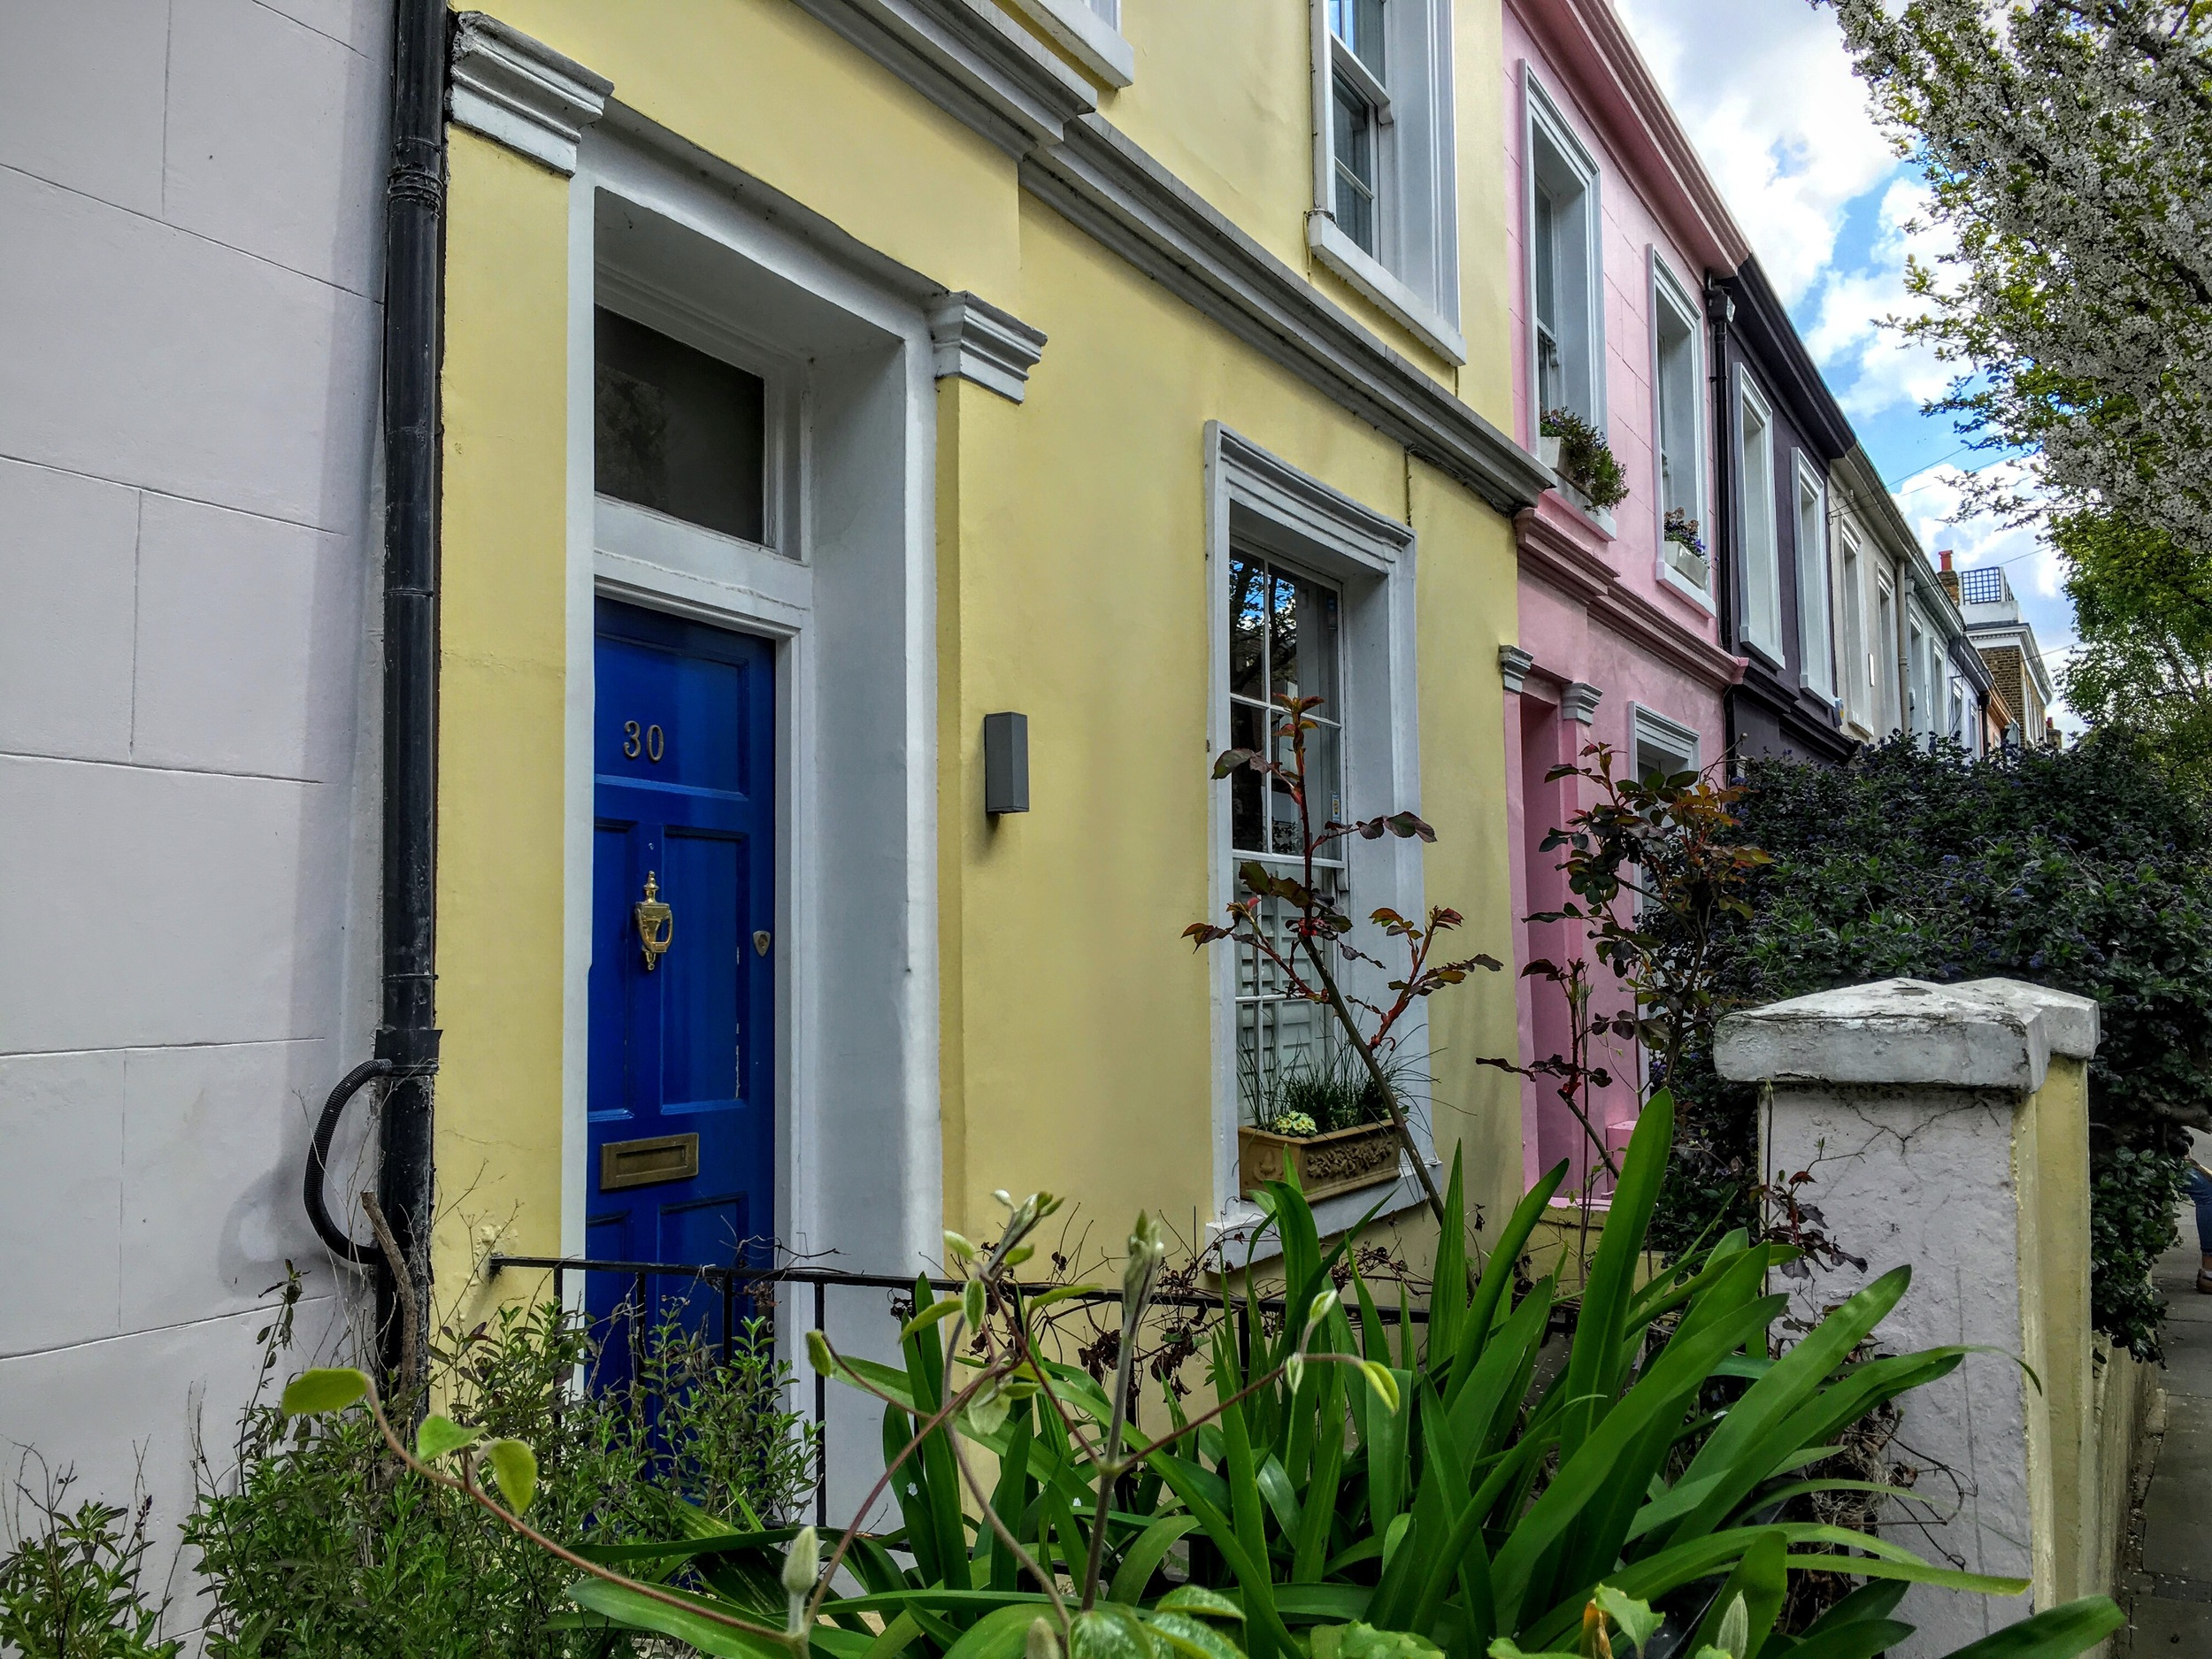 Portobello Road colourful houses